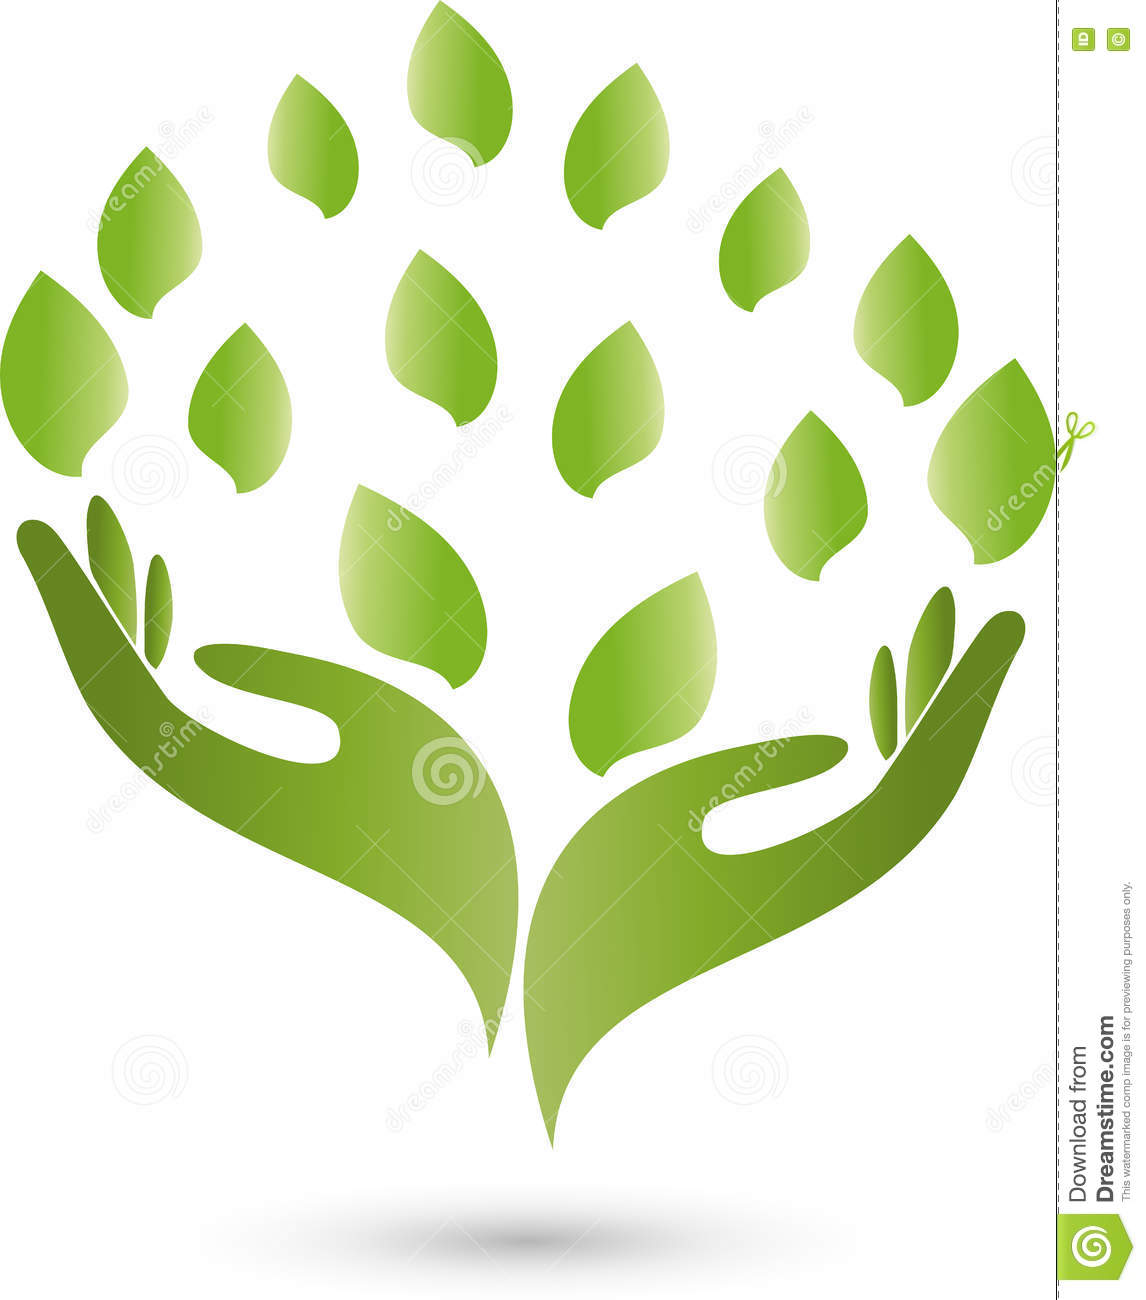 Naturopath Clip Art.